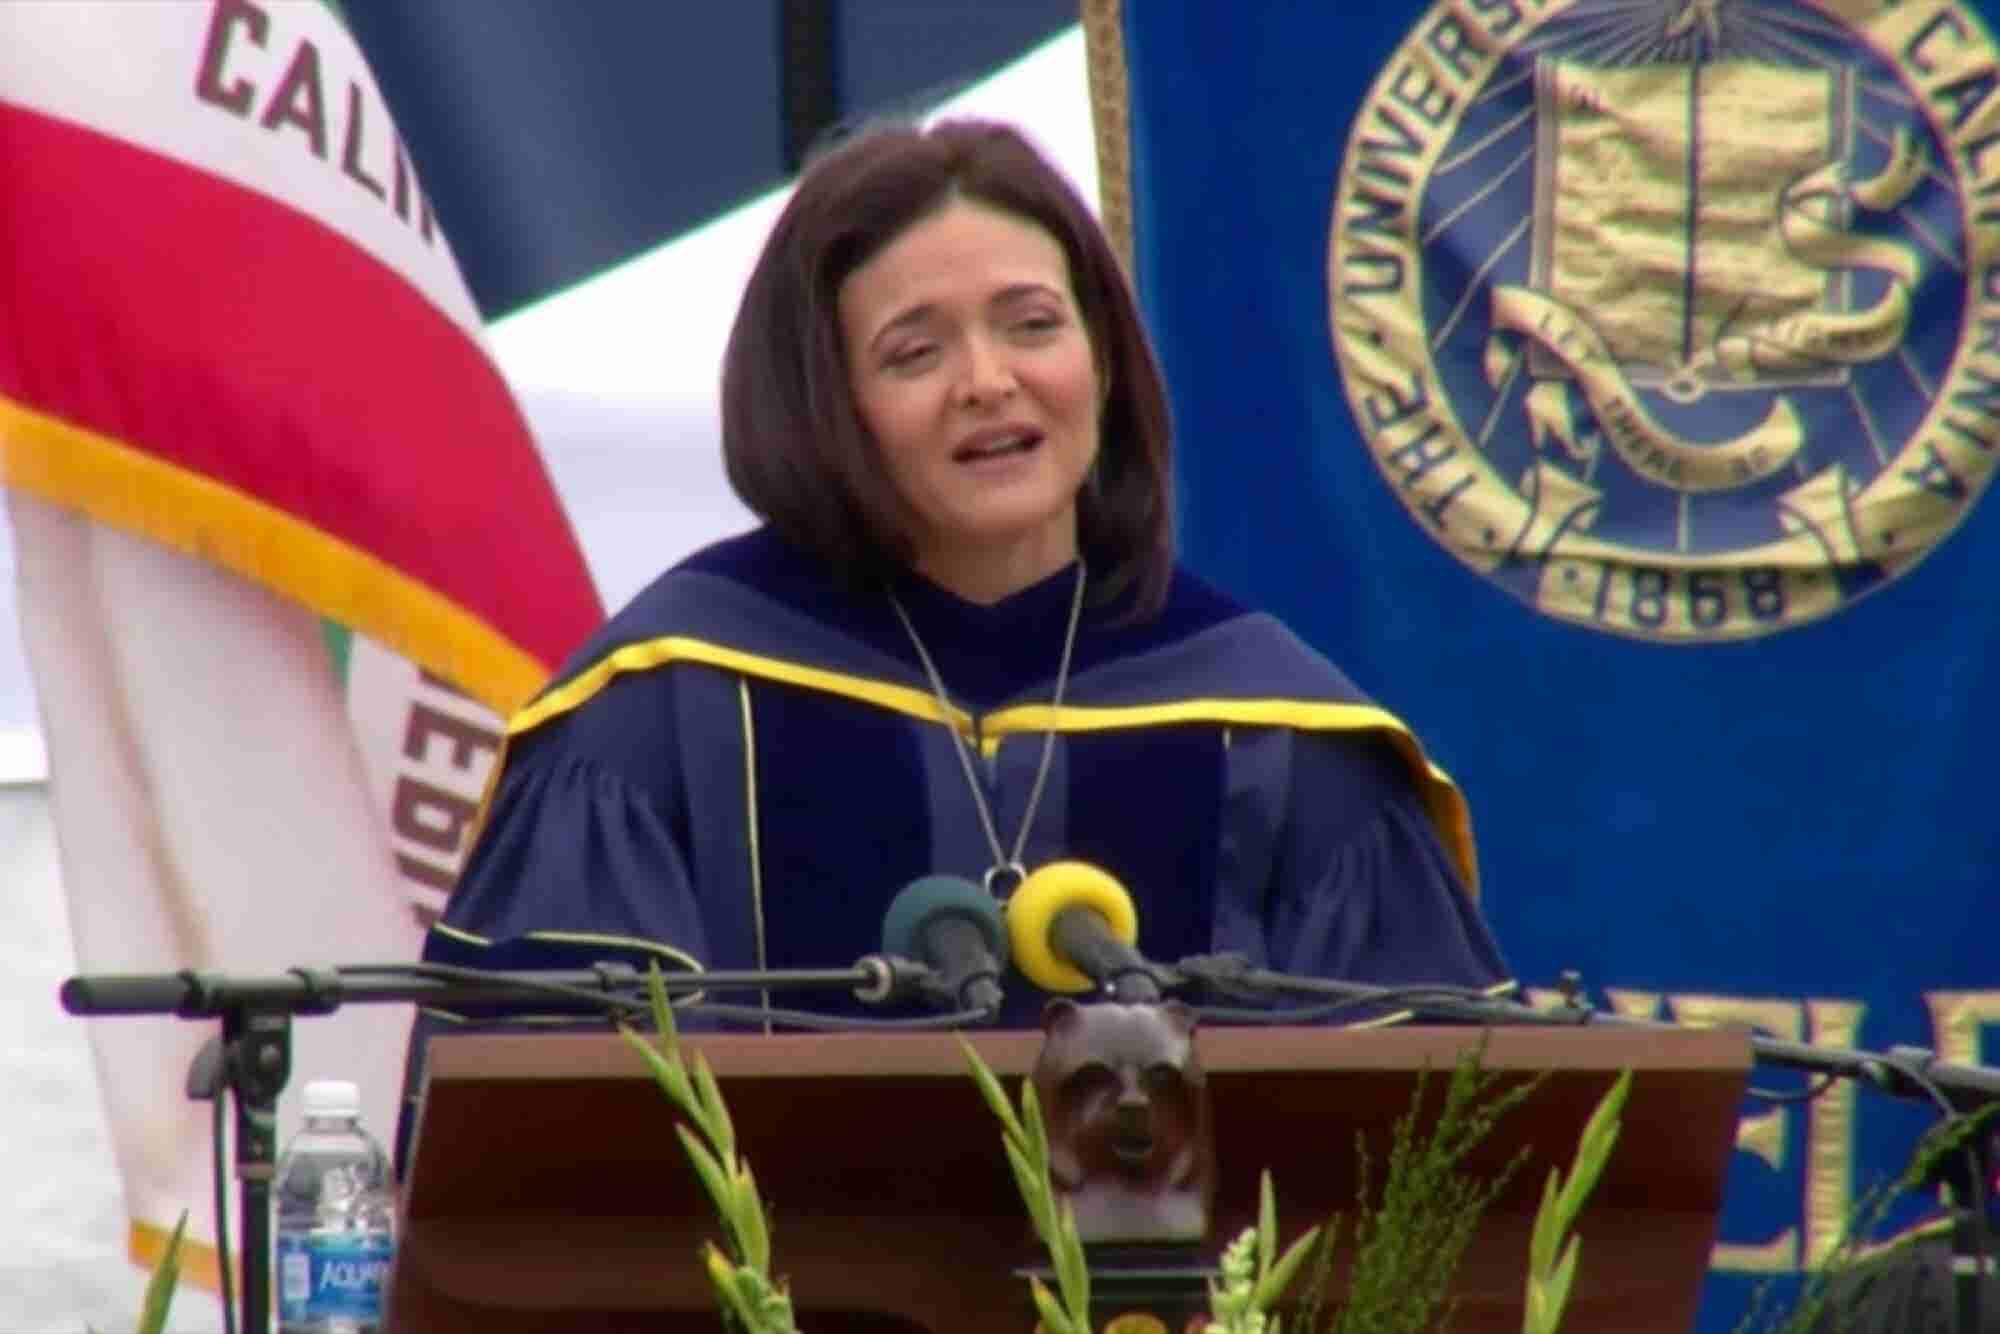 Sheryl Sandberg Commencement Speech, University of California at Berkeley, May 2016 (Transcript)